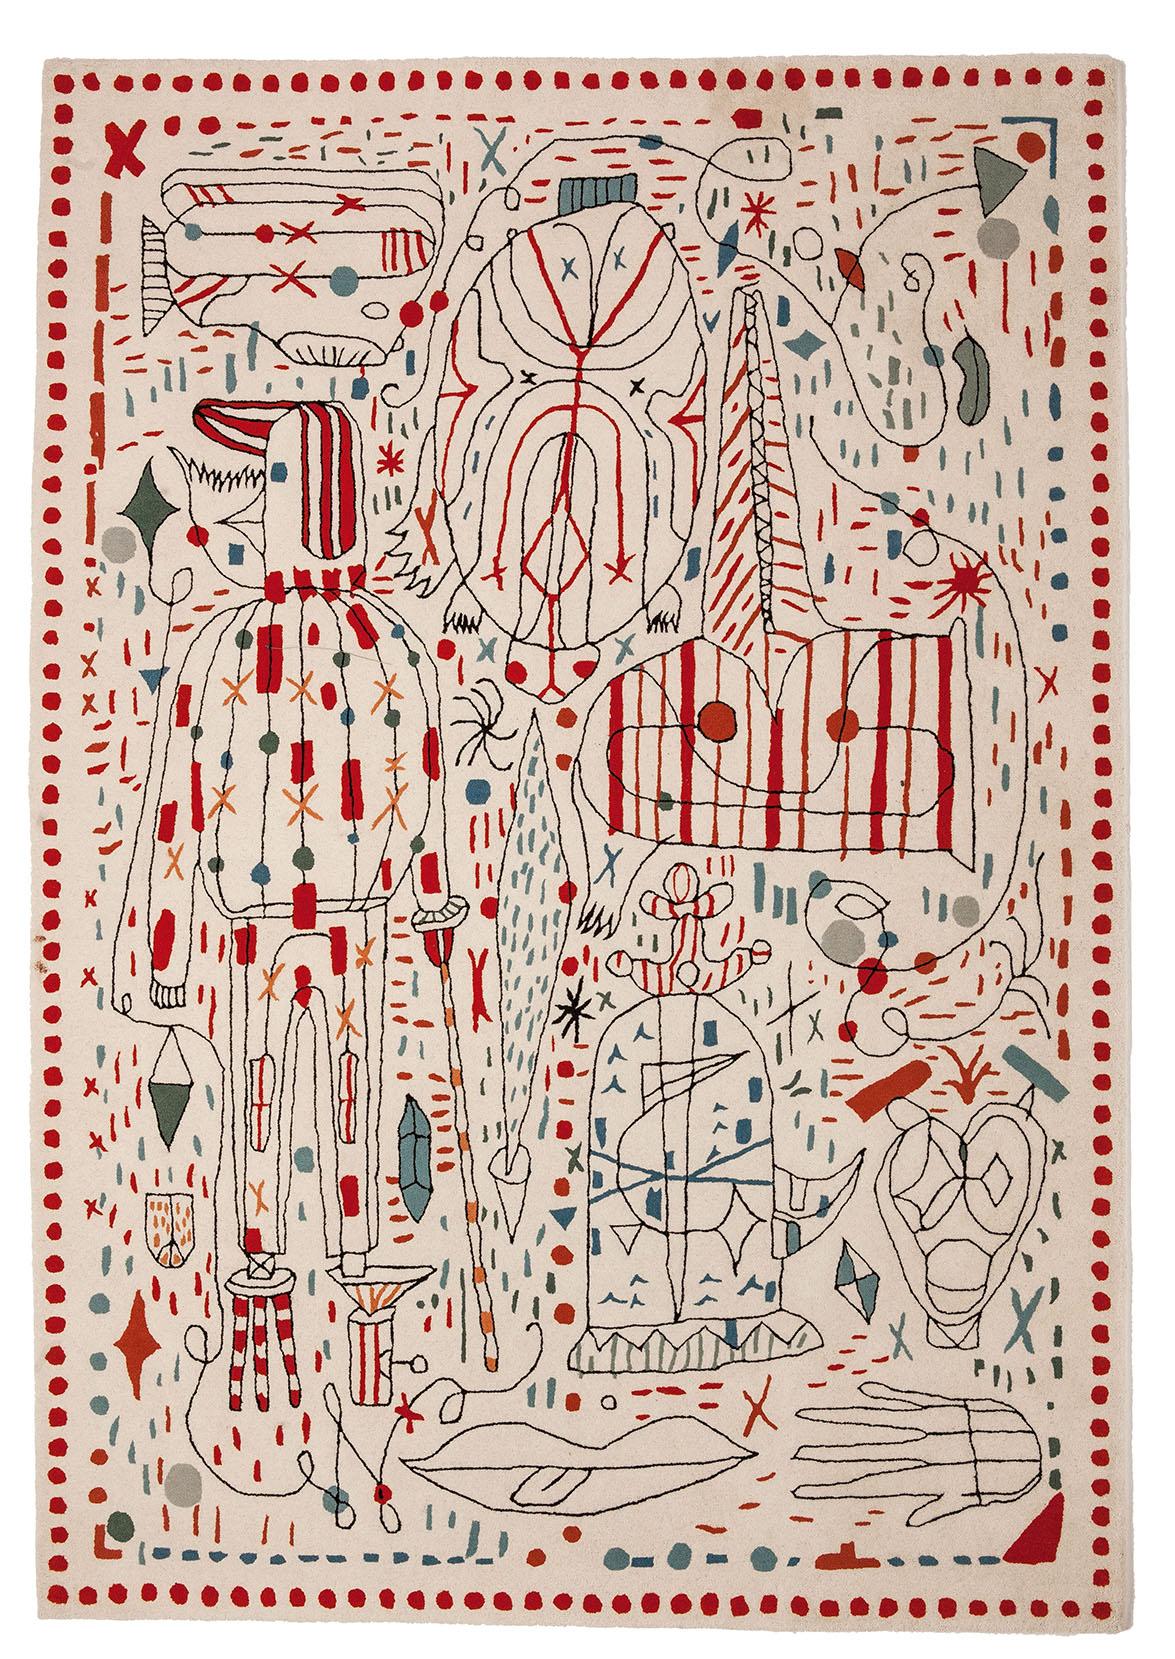 Hayon x nani una colecci n de alfombras on rica alocada - Alfombras nani marquina ...